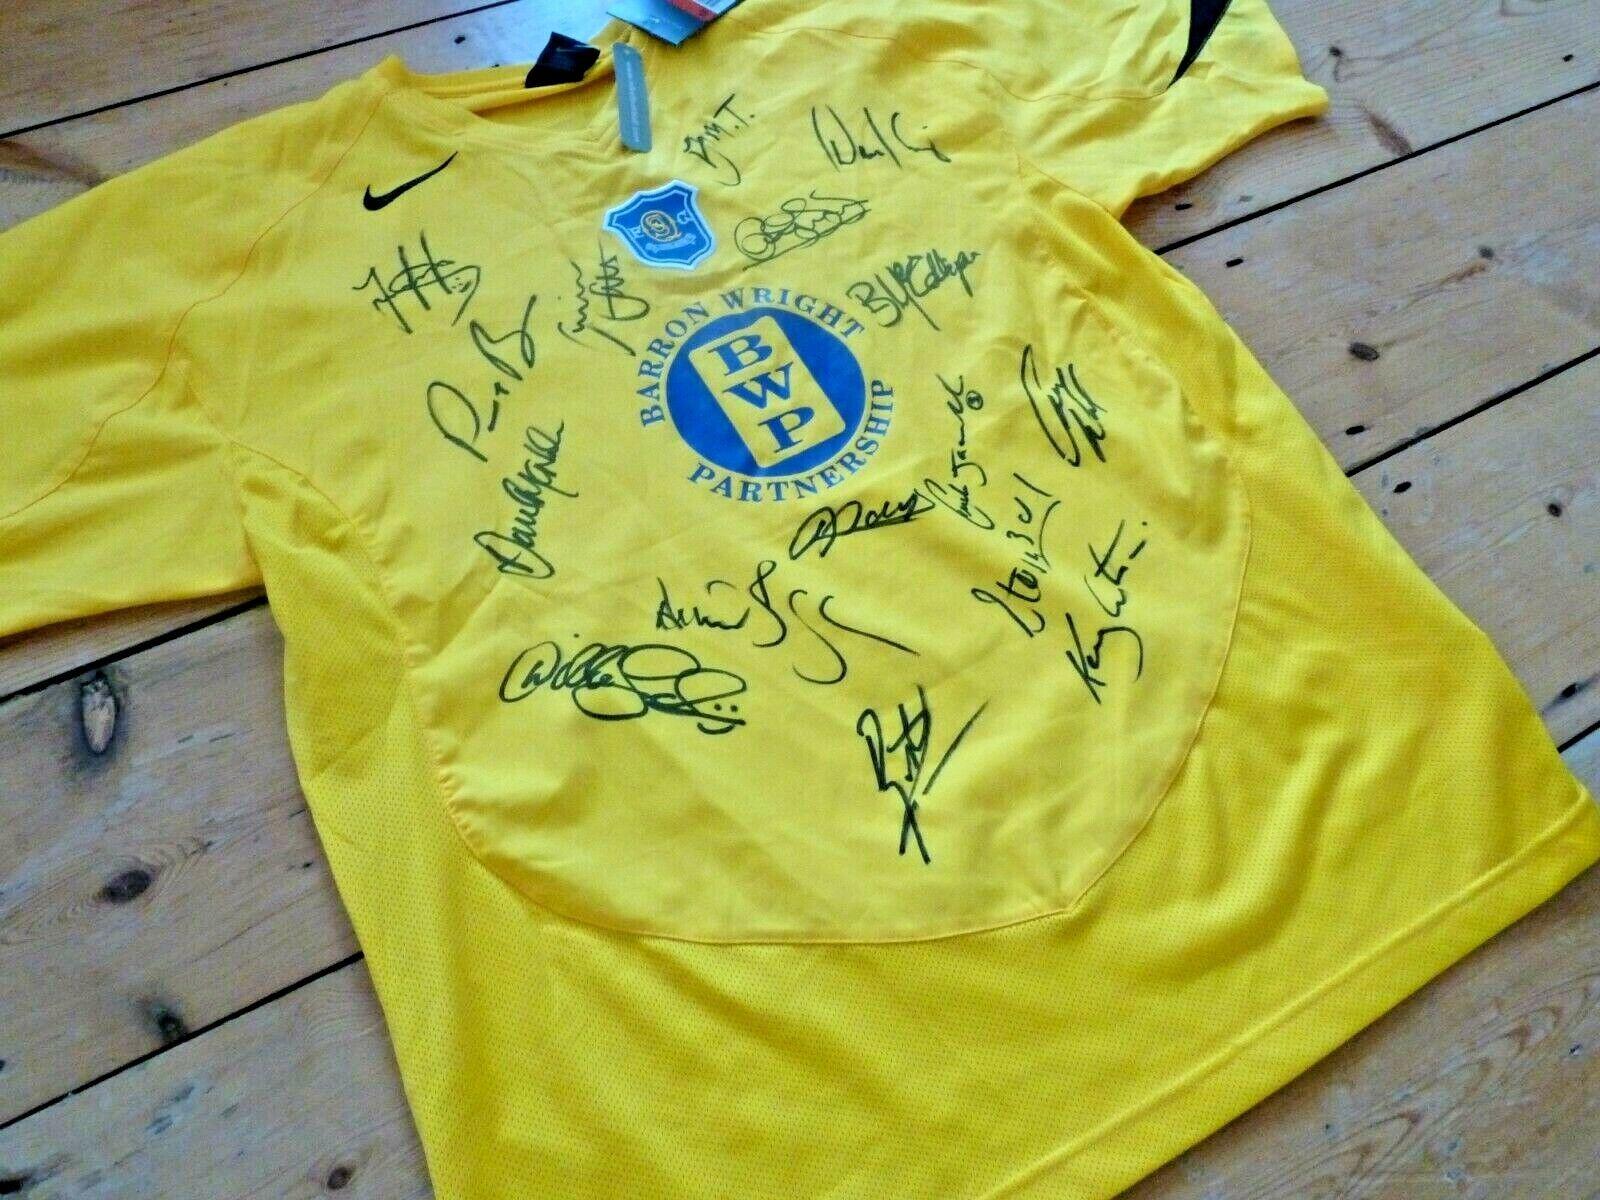 Queen Of The South Maillot de Football Dumfries & Galloway Équipe Signé X 16